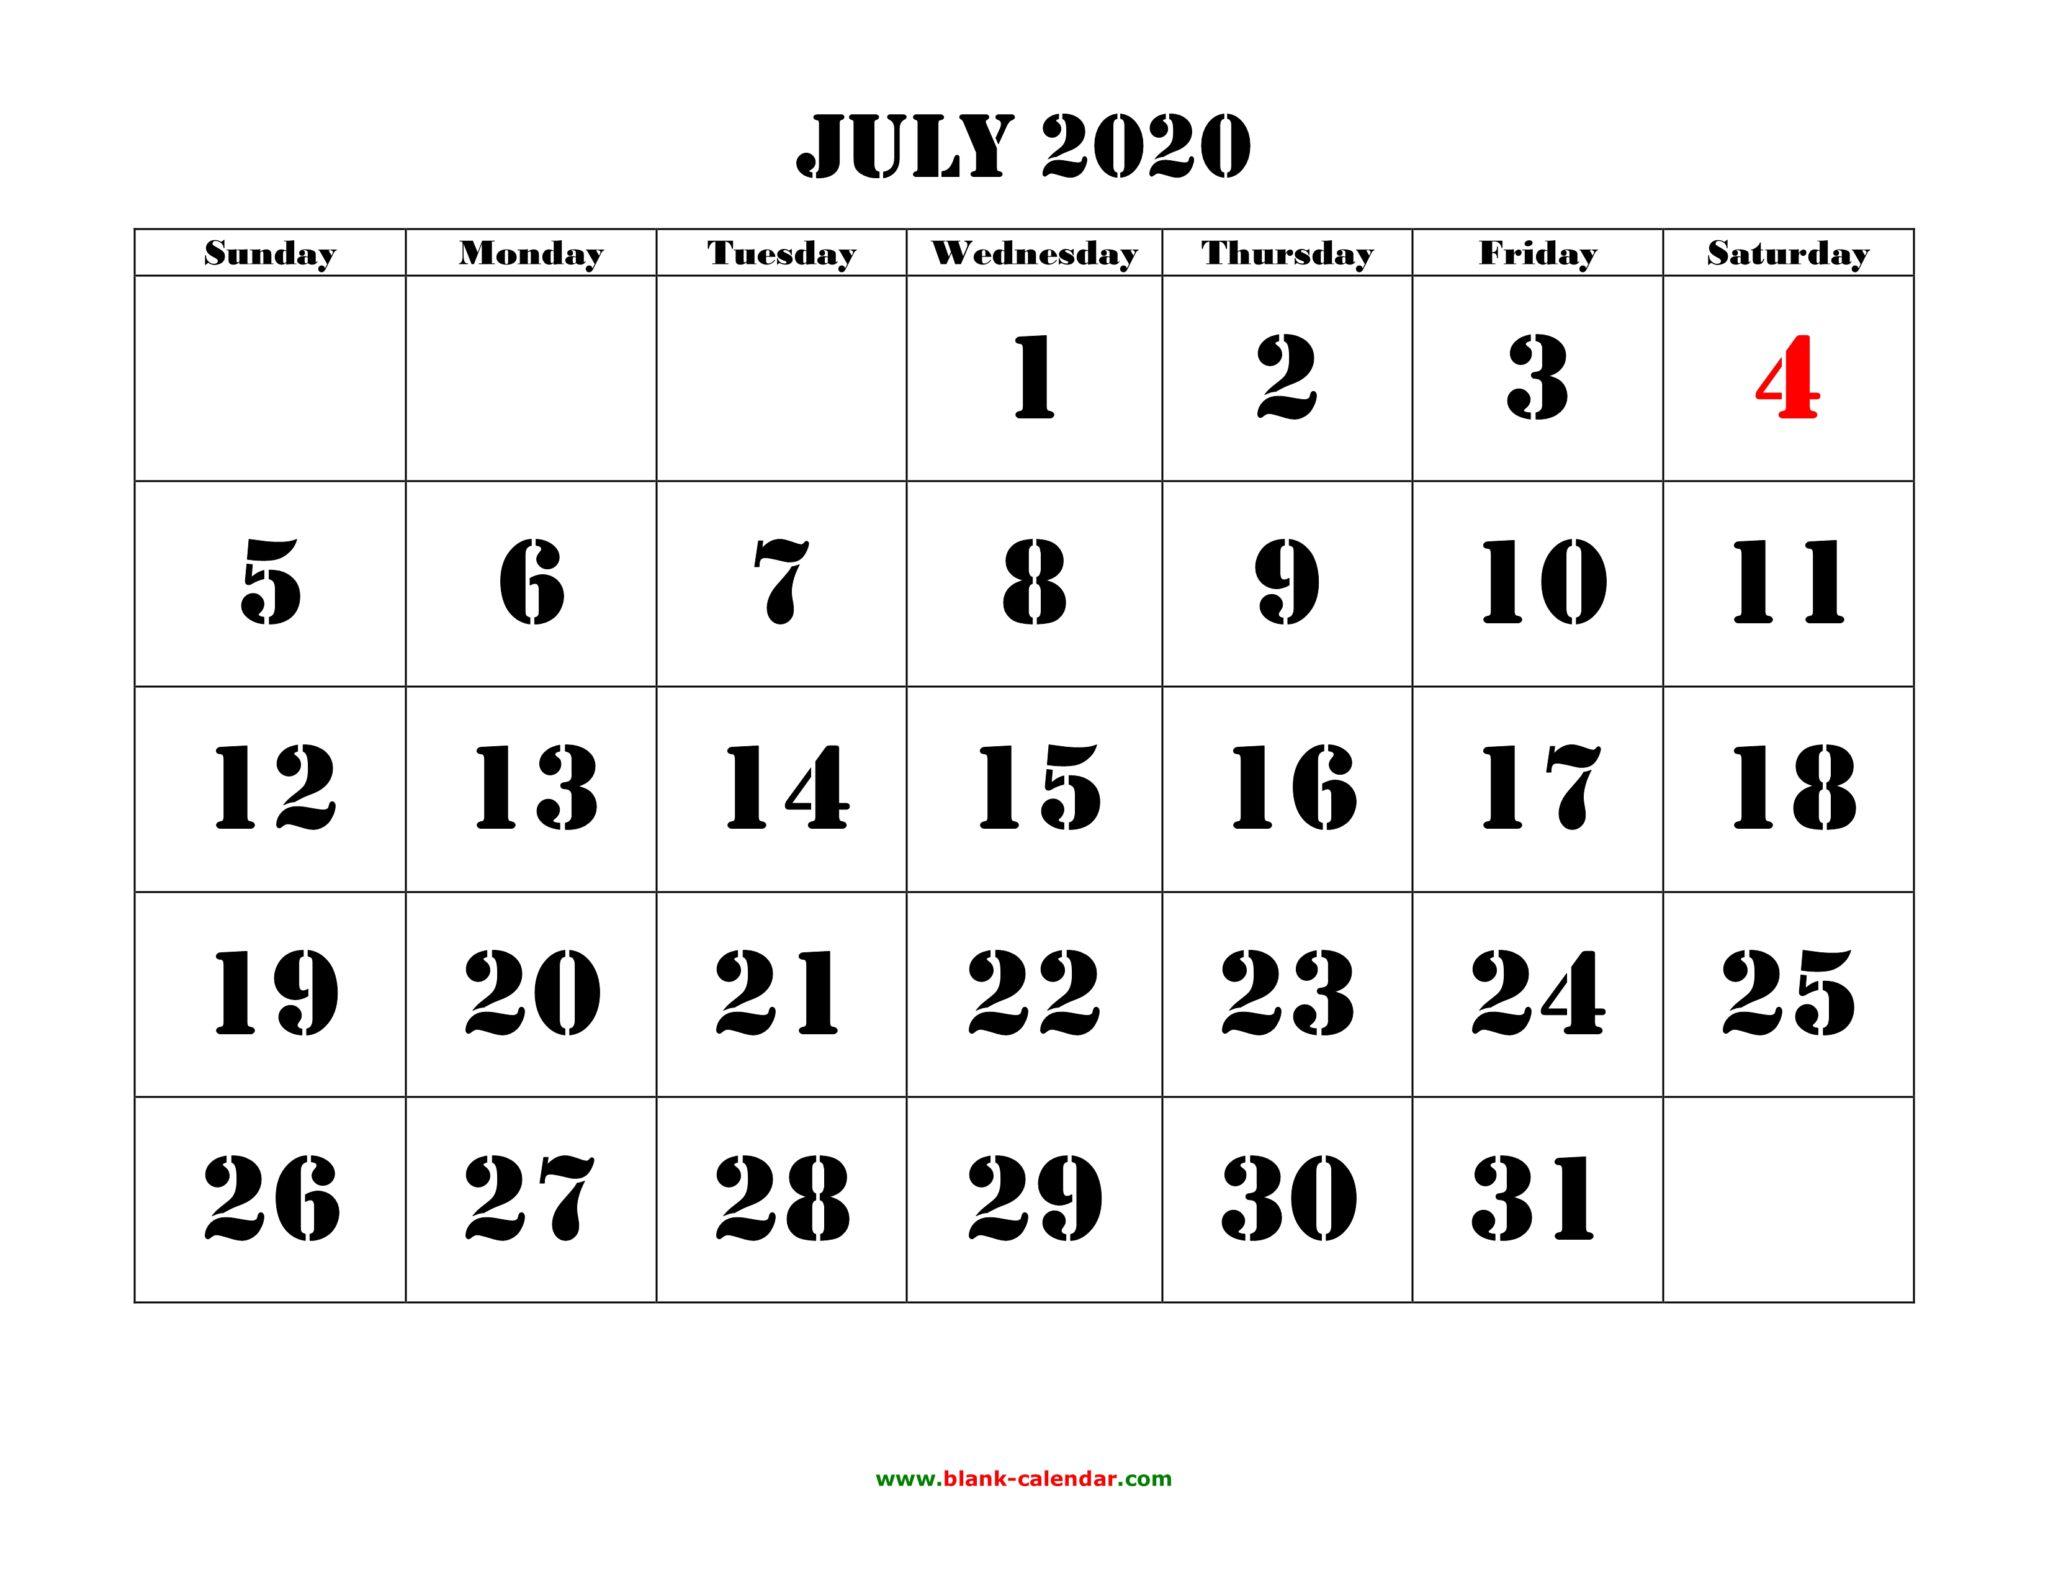 July 2020 Calendar Printable Templates Holidays - July 2020 Calendar regarding 2020 Vertex Calendars Printable Free